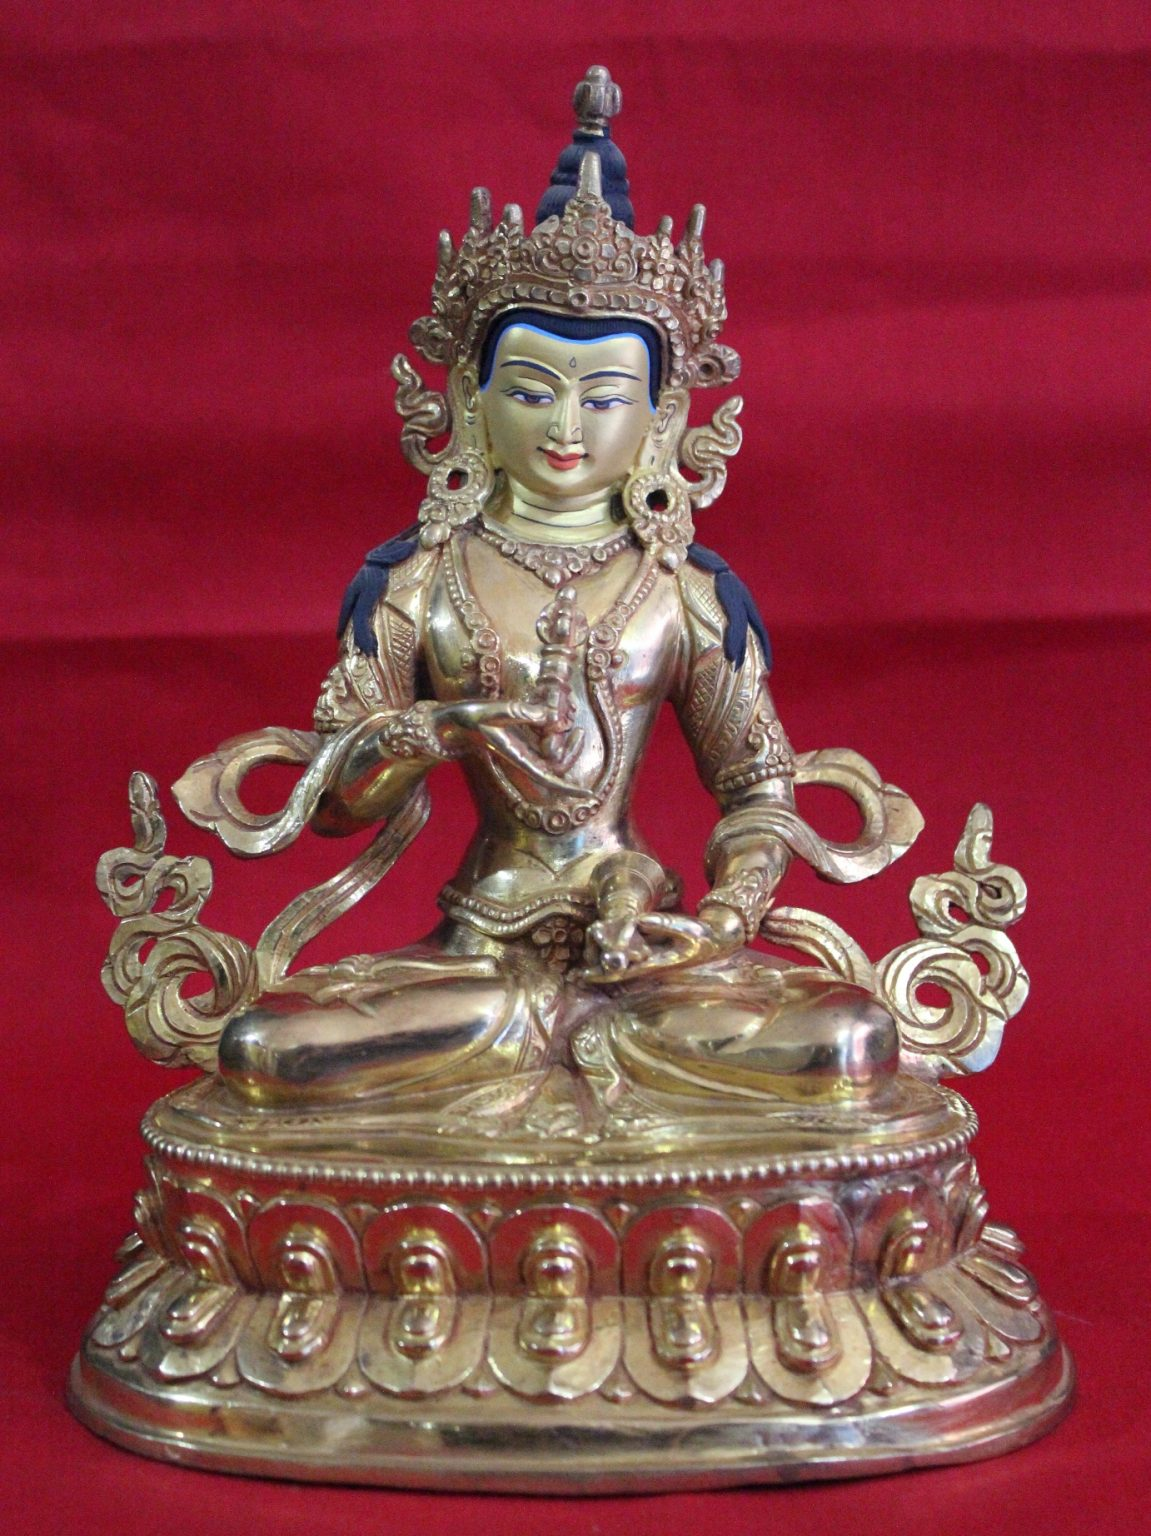 Vajrasattva Golden Buddha Statue Gifts